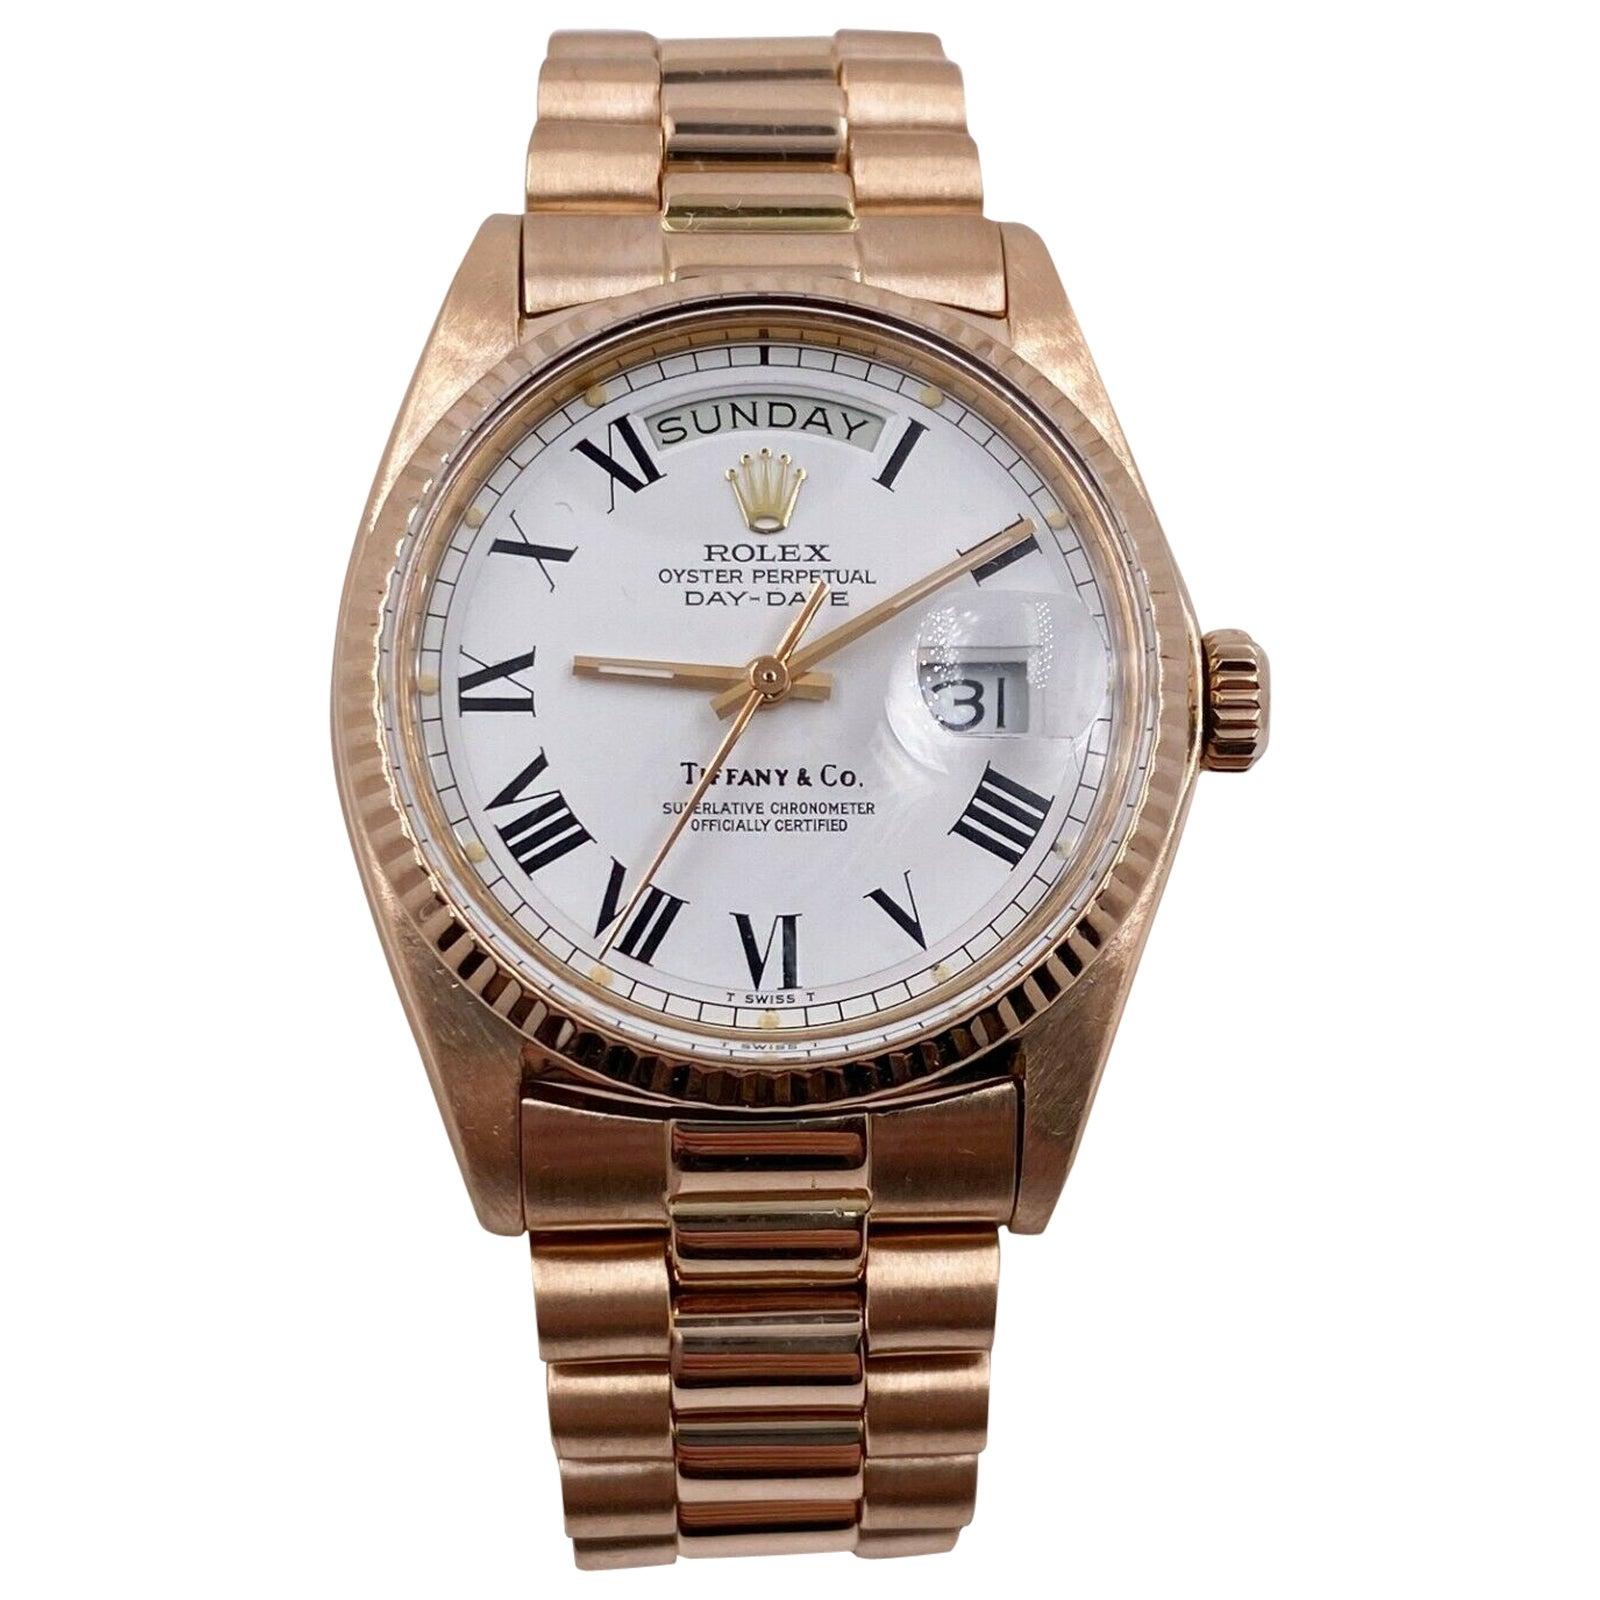 Vintage Rolex Day Date President 1803 Tiffany & Co. Dial 18 Karat Rose Gold